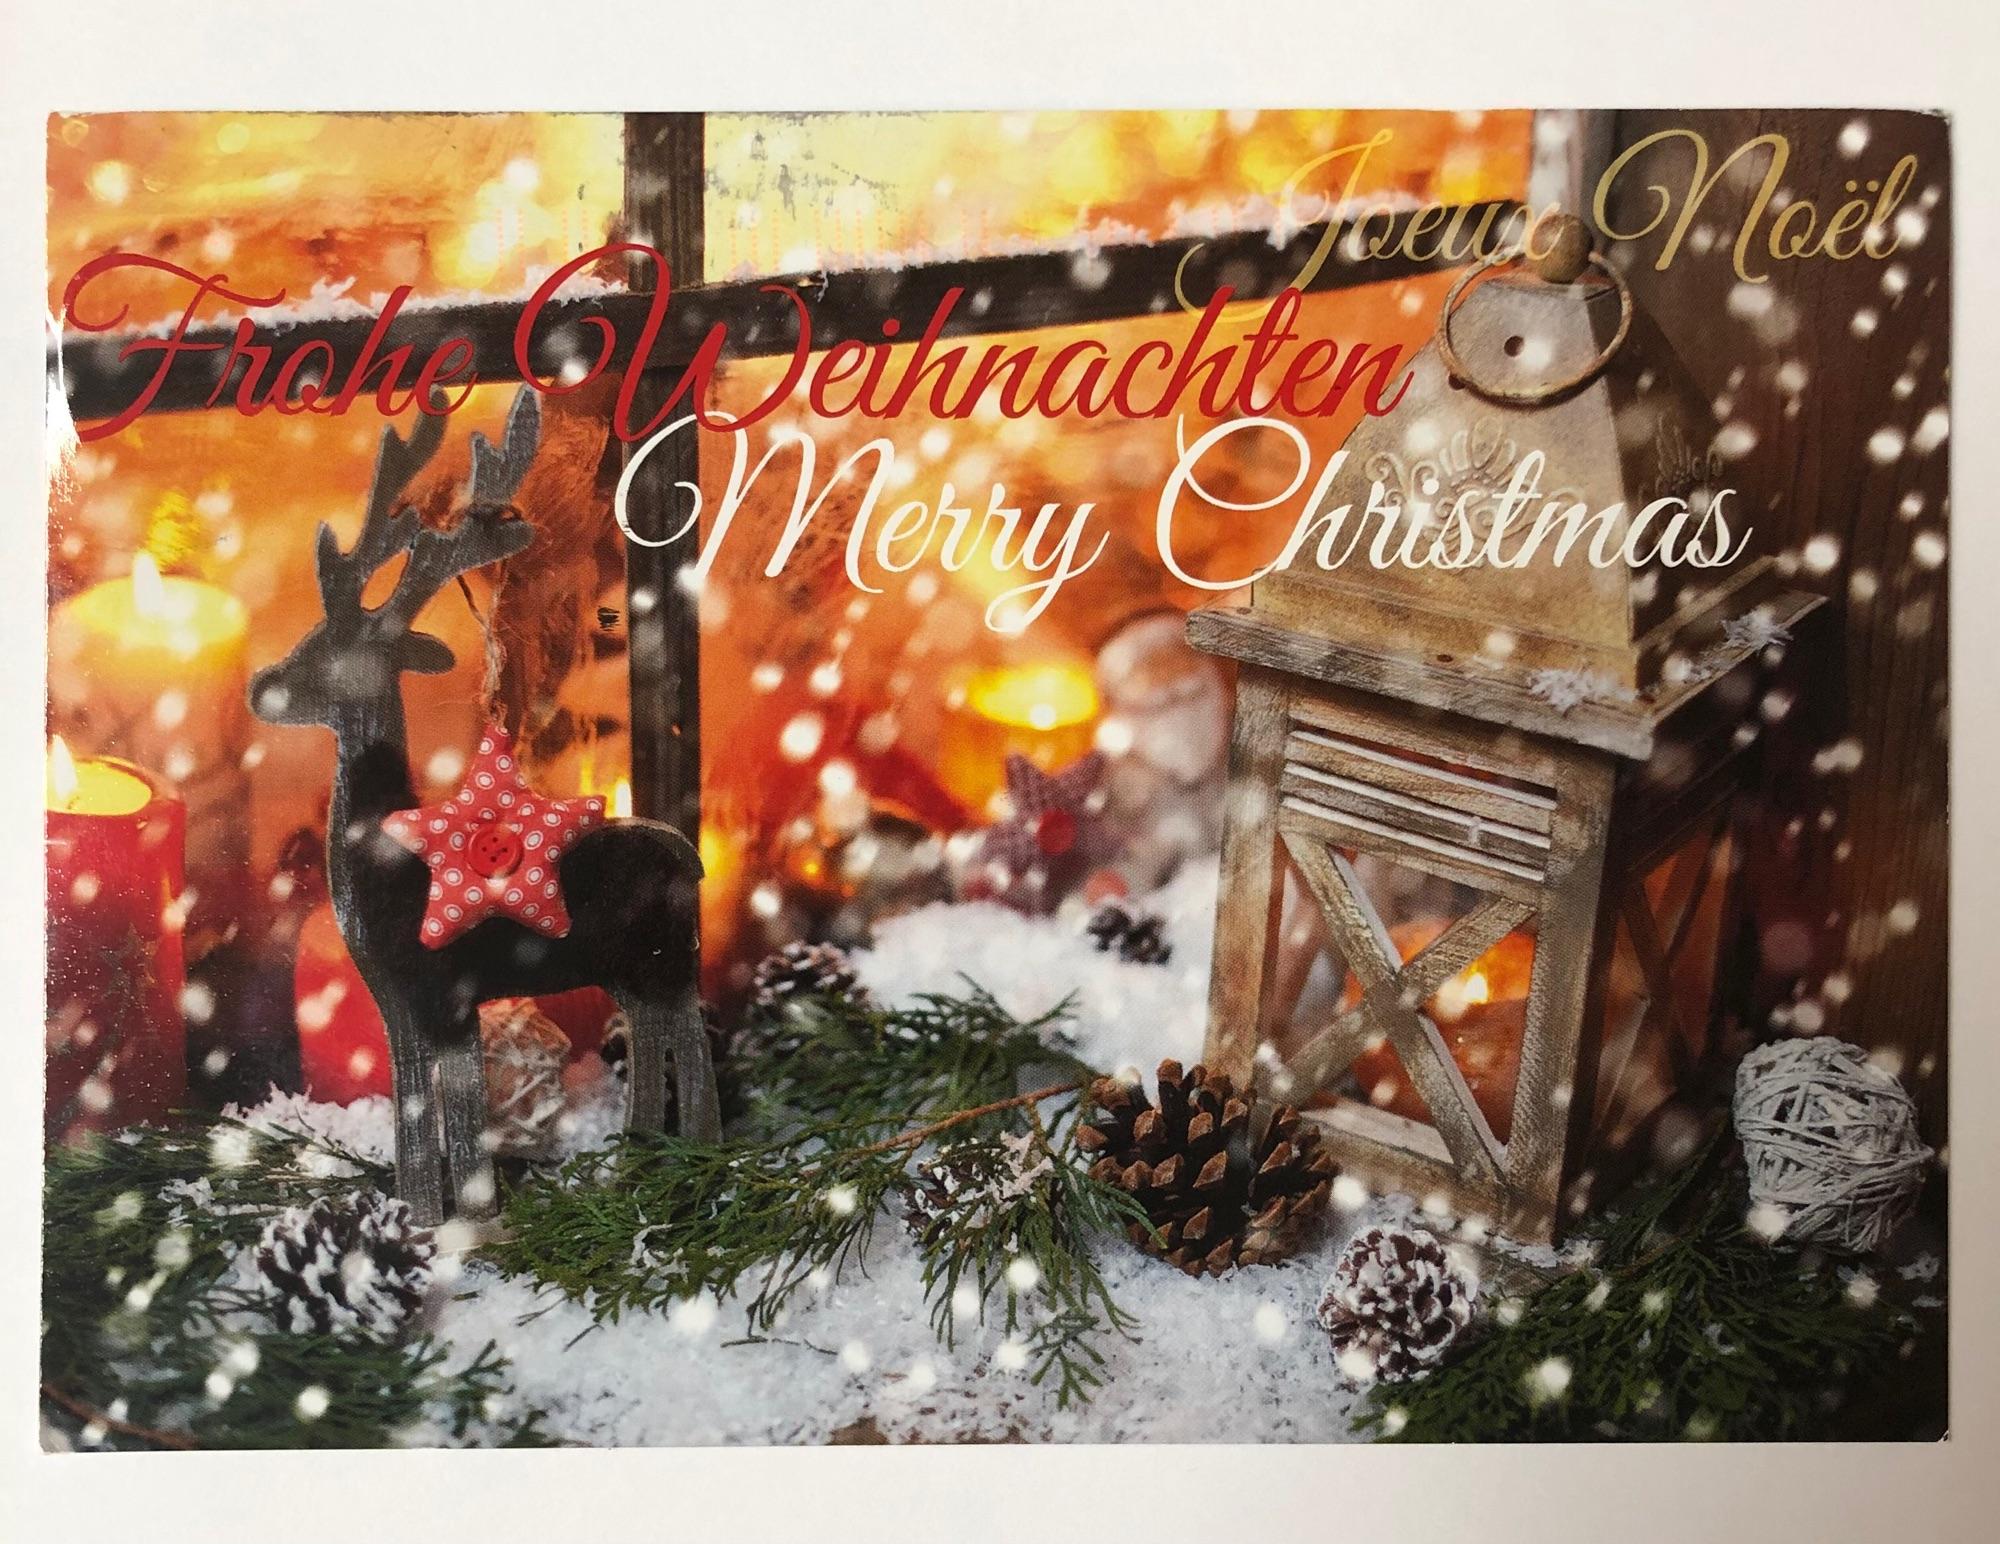 Very pretty postcard from Imma in Deutschland. It's so festive and pretty :)